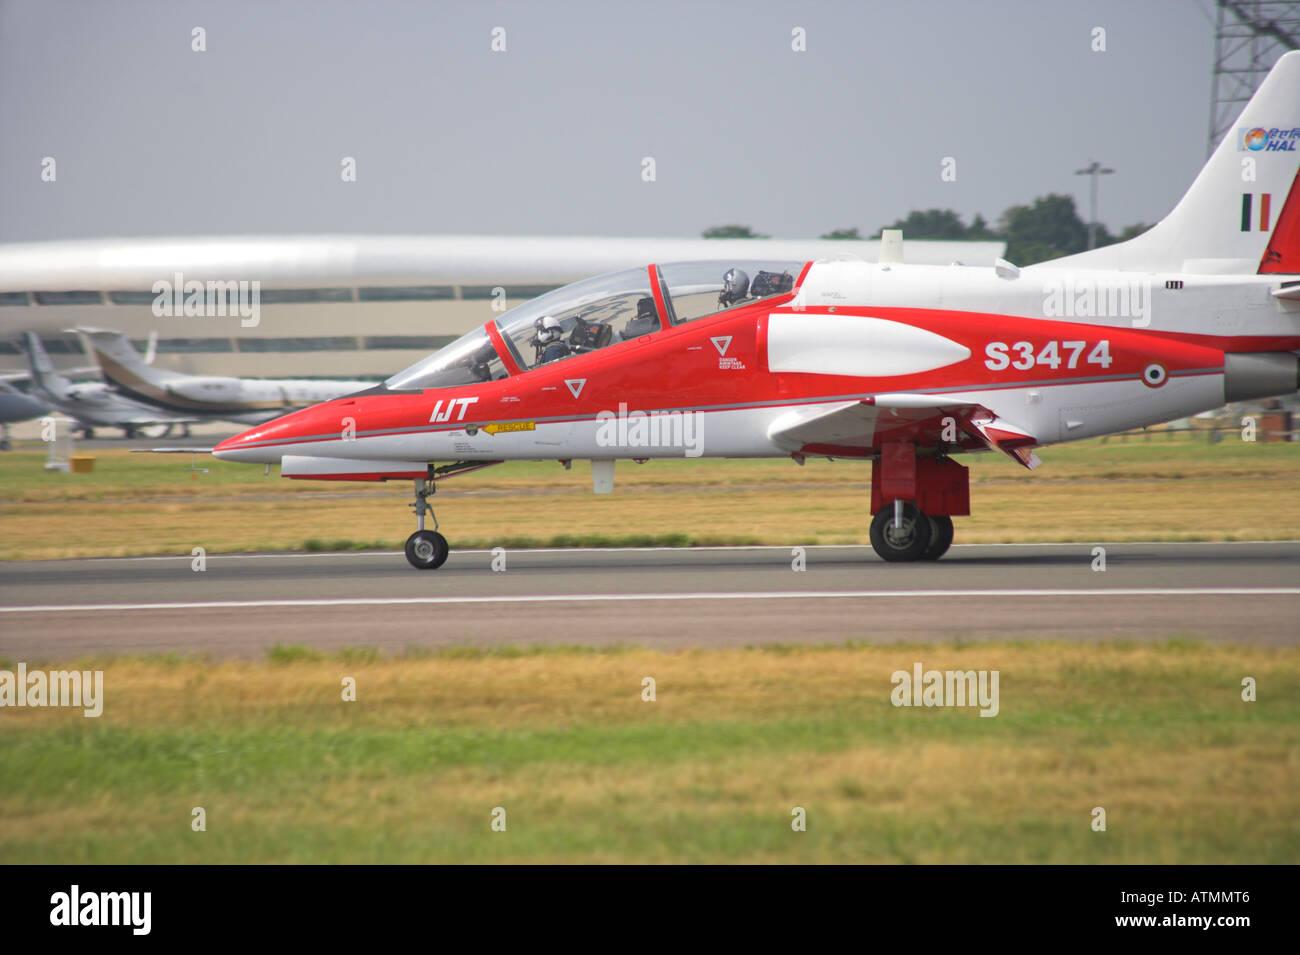 Hindustan Aeronautics Ltd IJT 36 Trainer landing - Stock Image